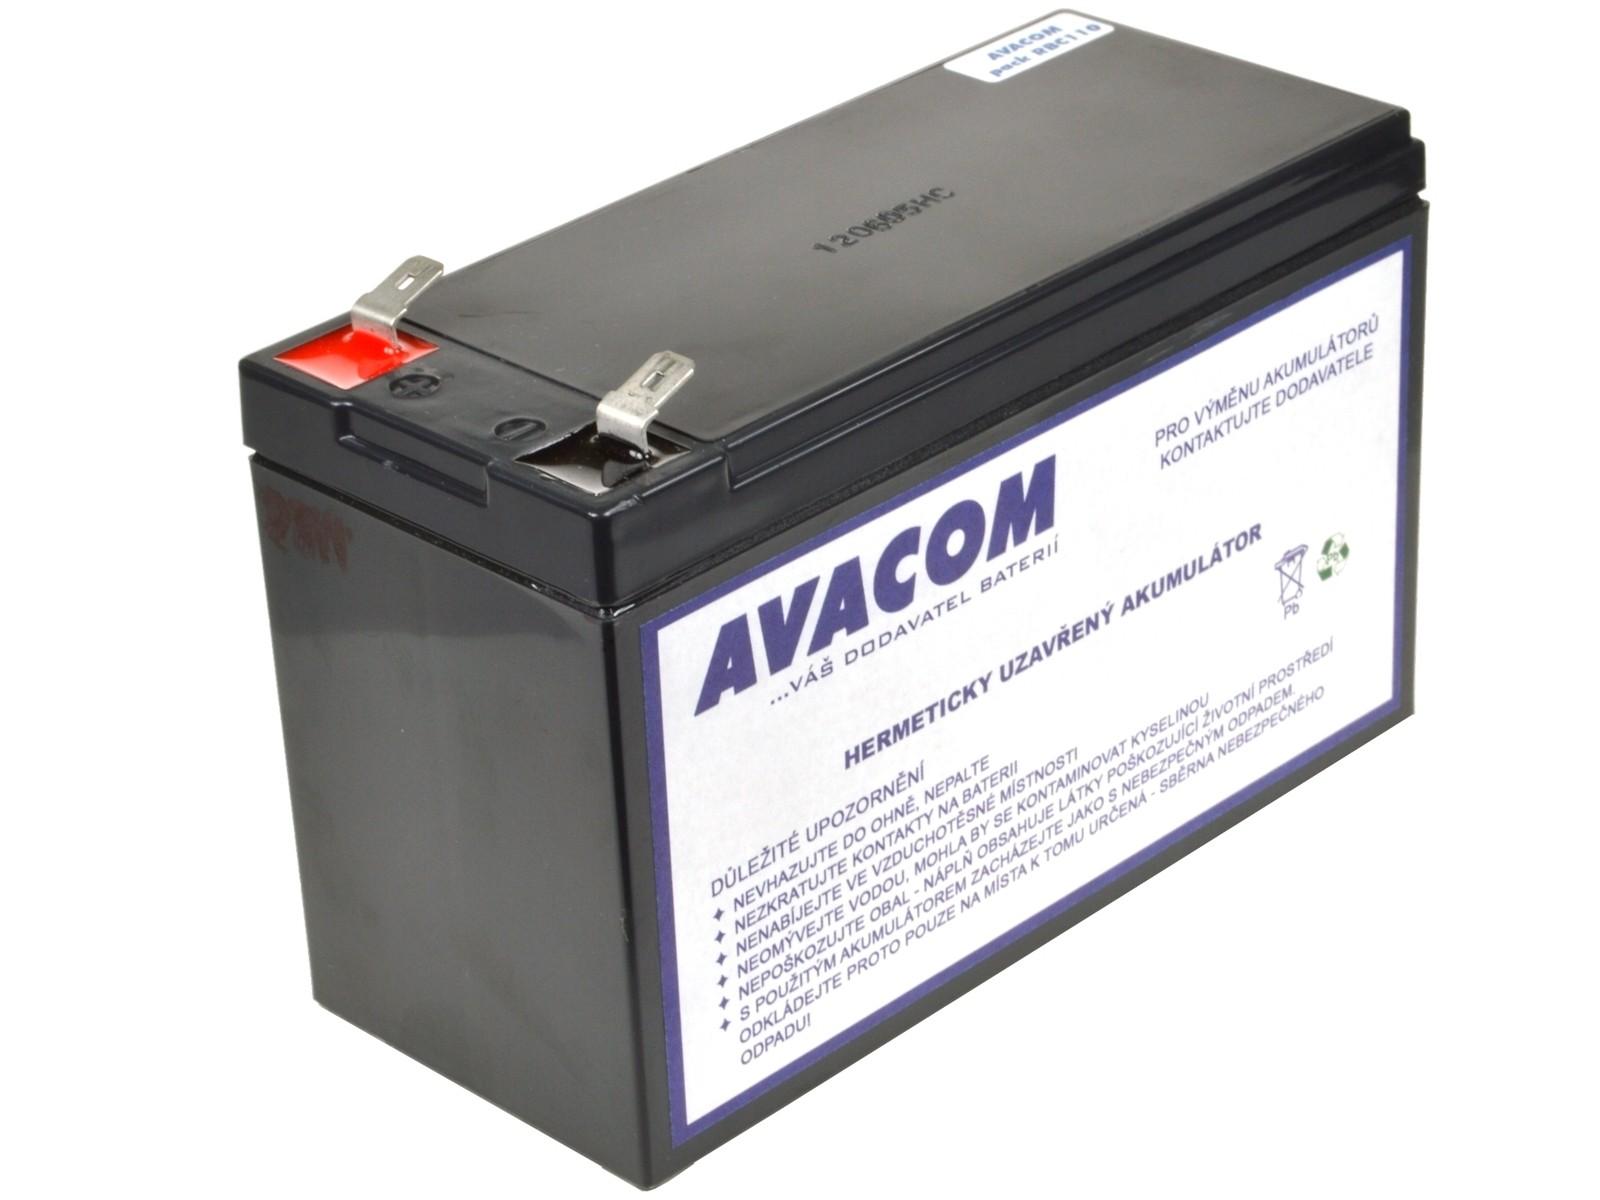 Baterie AVACOM AVA-RBC110 náhrada za RBC110 - baterie pro UPS - AVA-RBC110